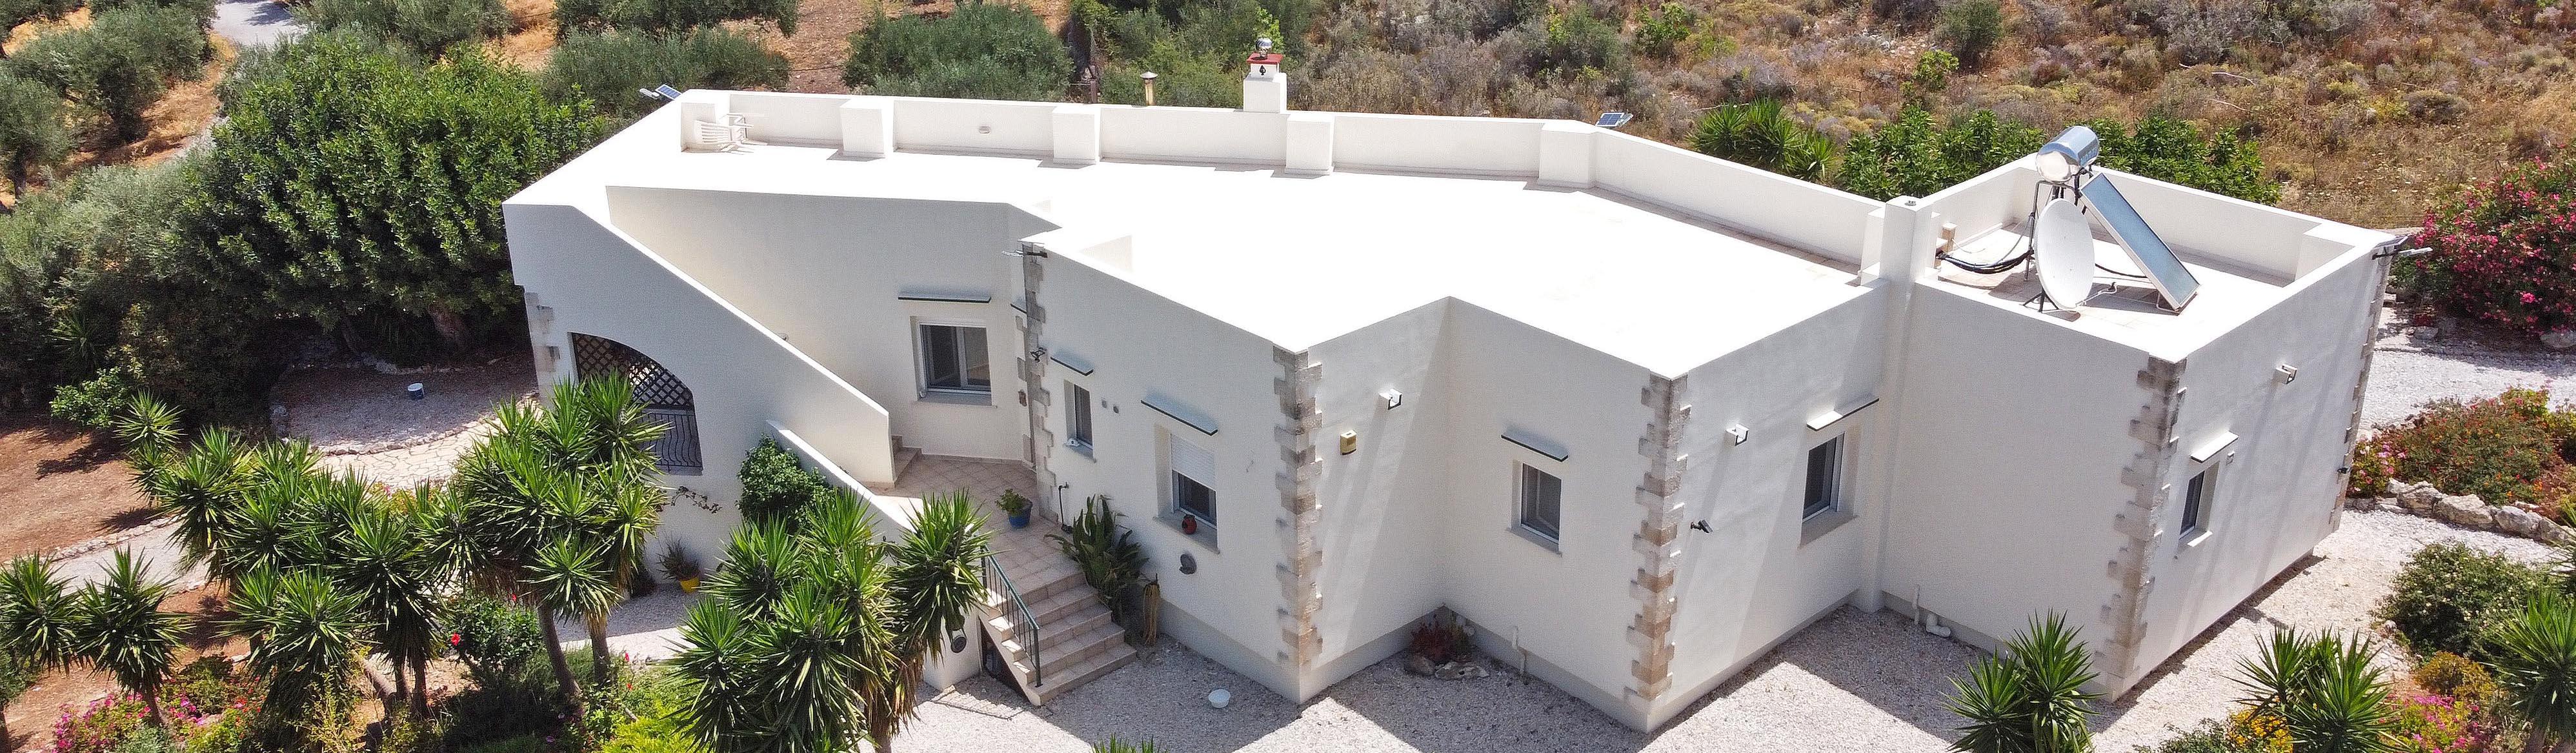 DC-912 3 Bed Detached Villa in Tsivaras €385,000